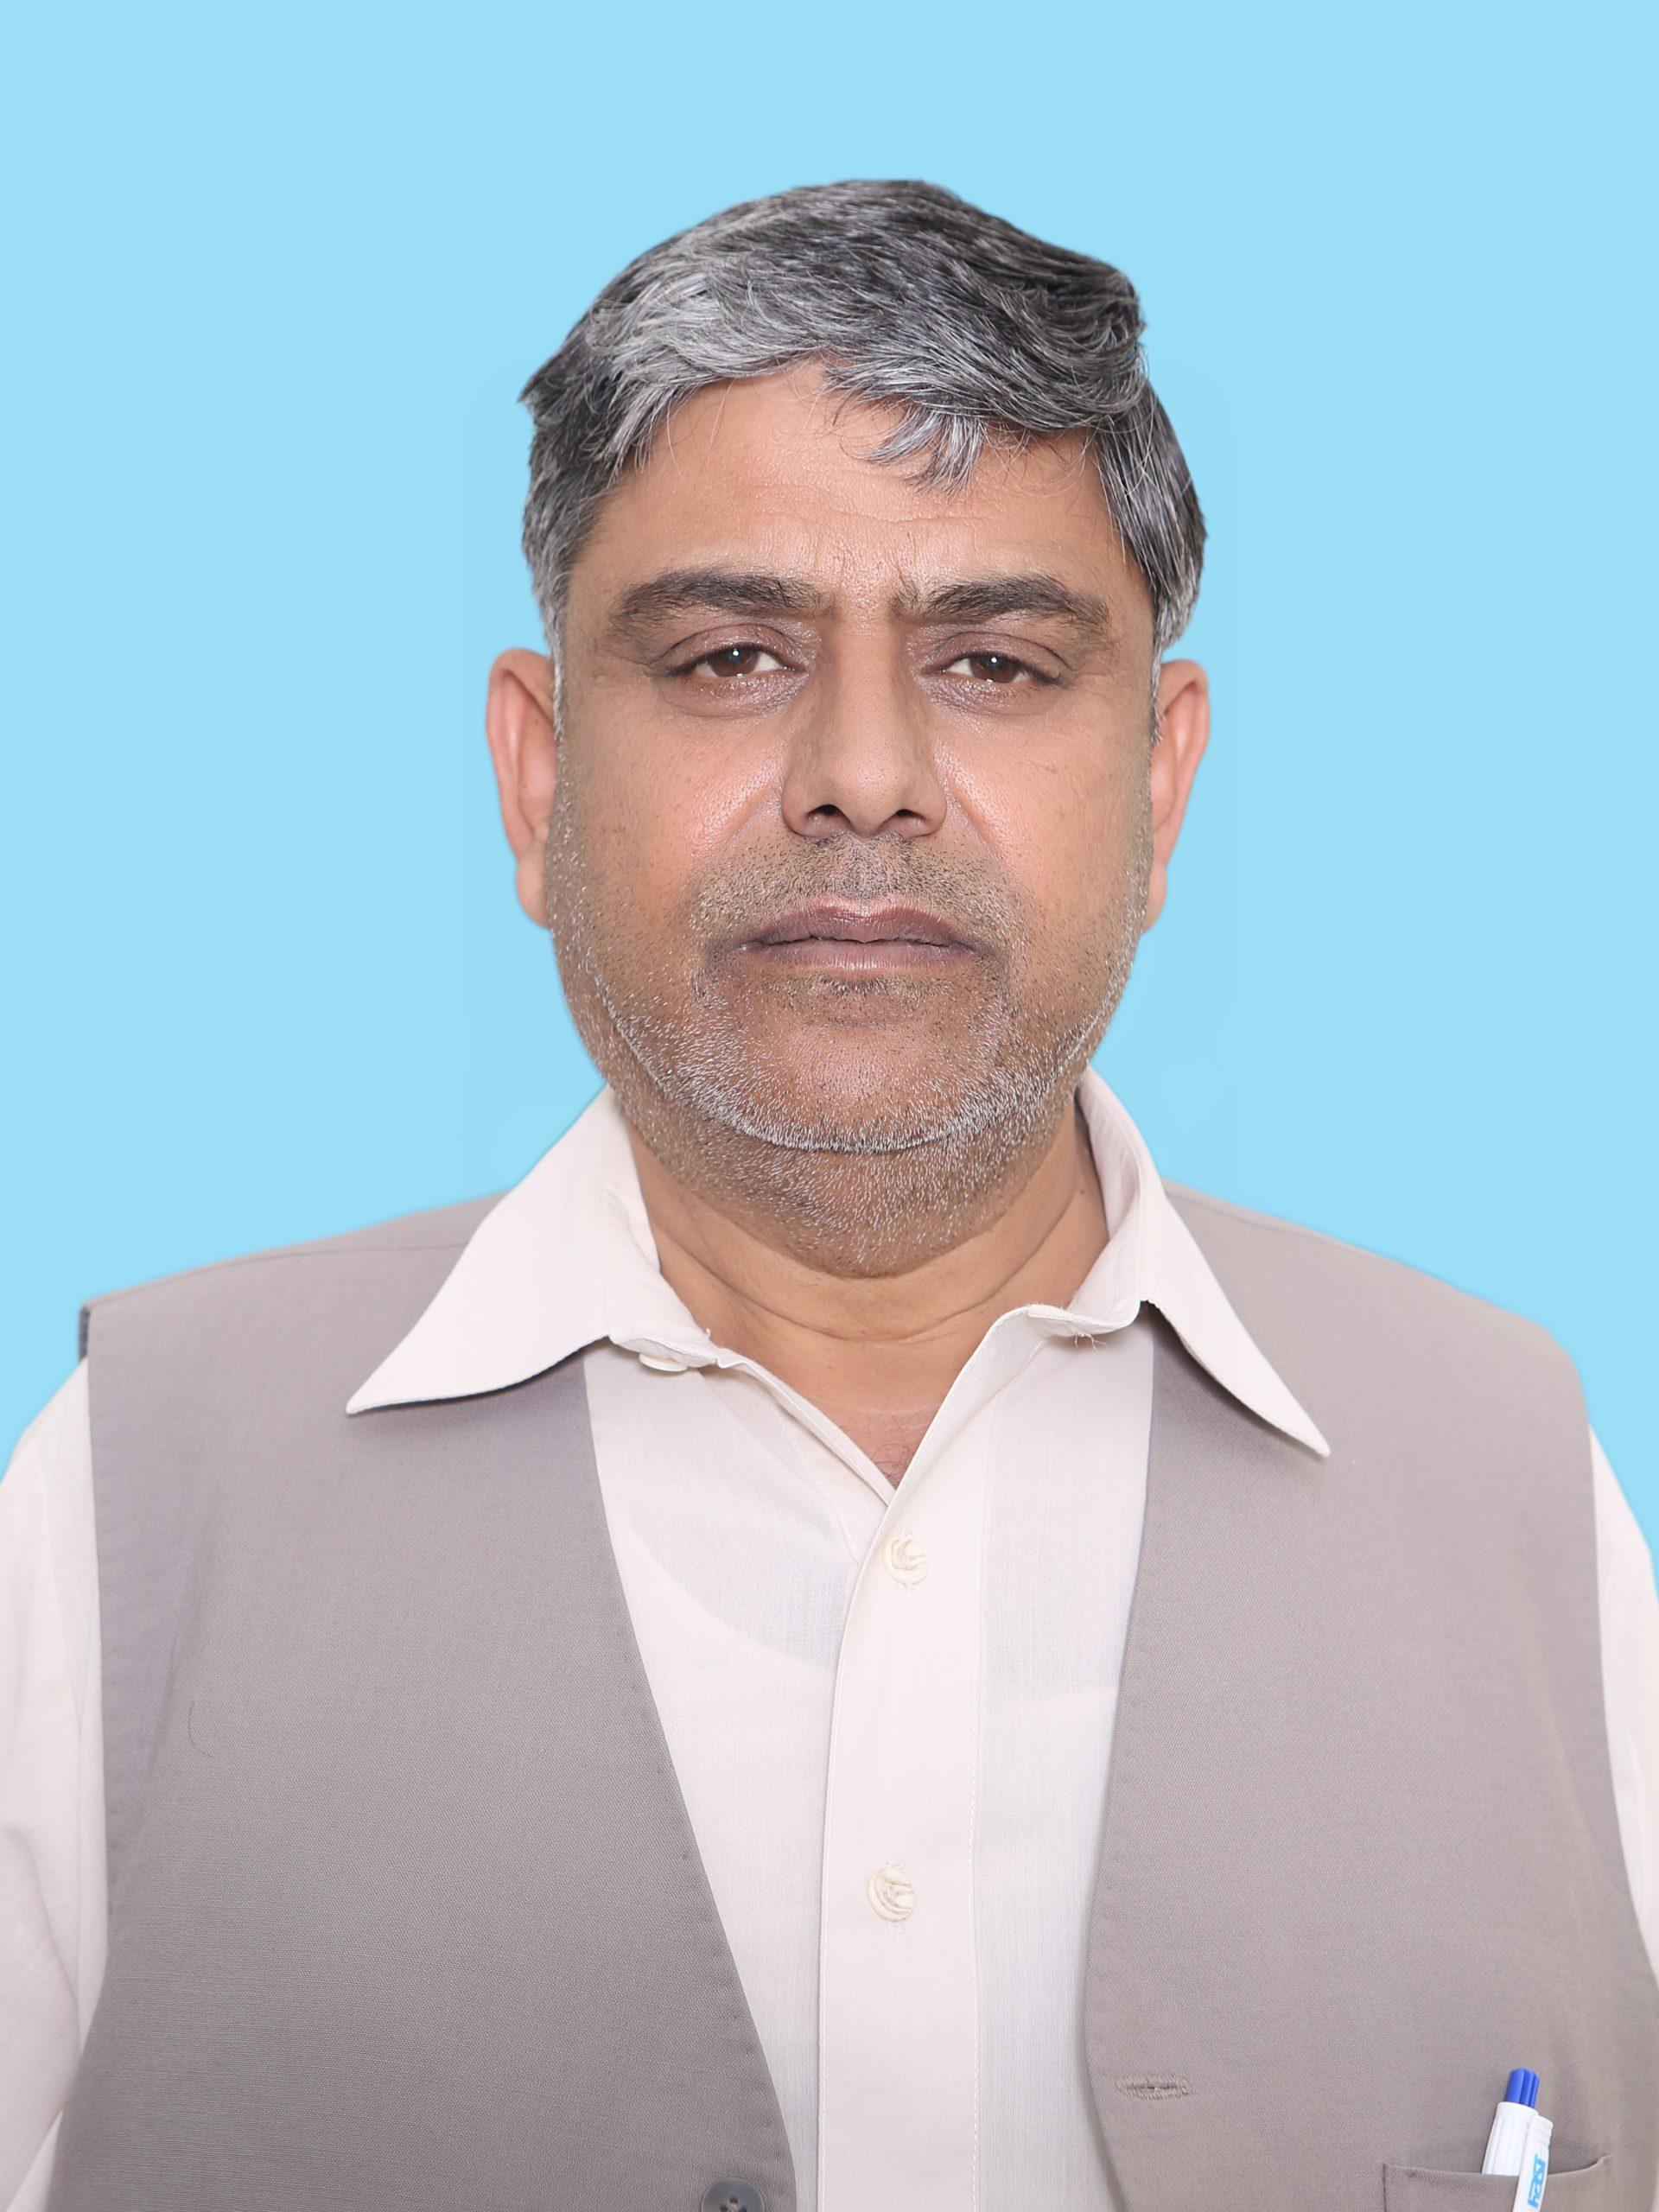 Muhammad Babar Khan